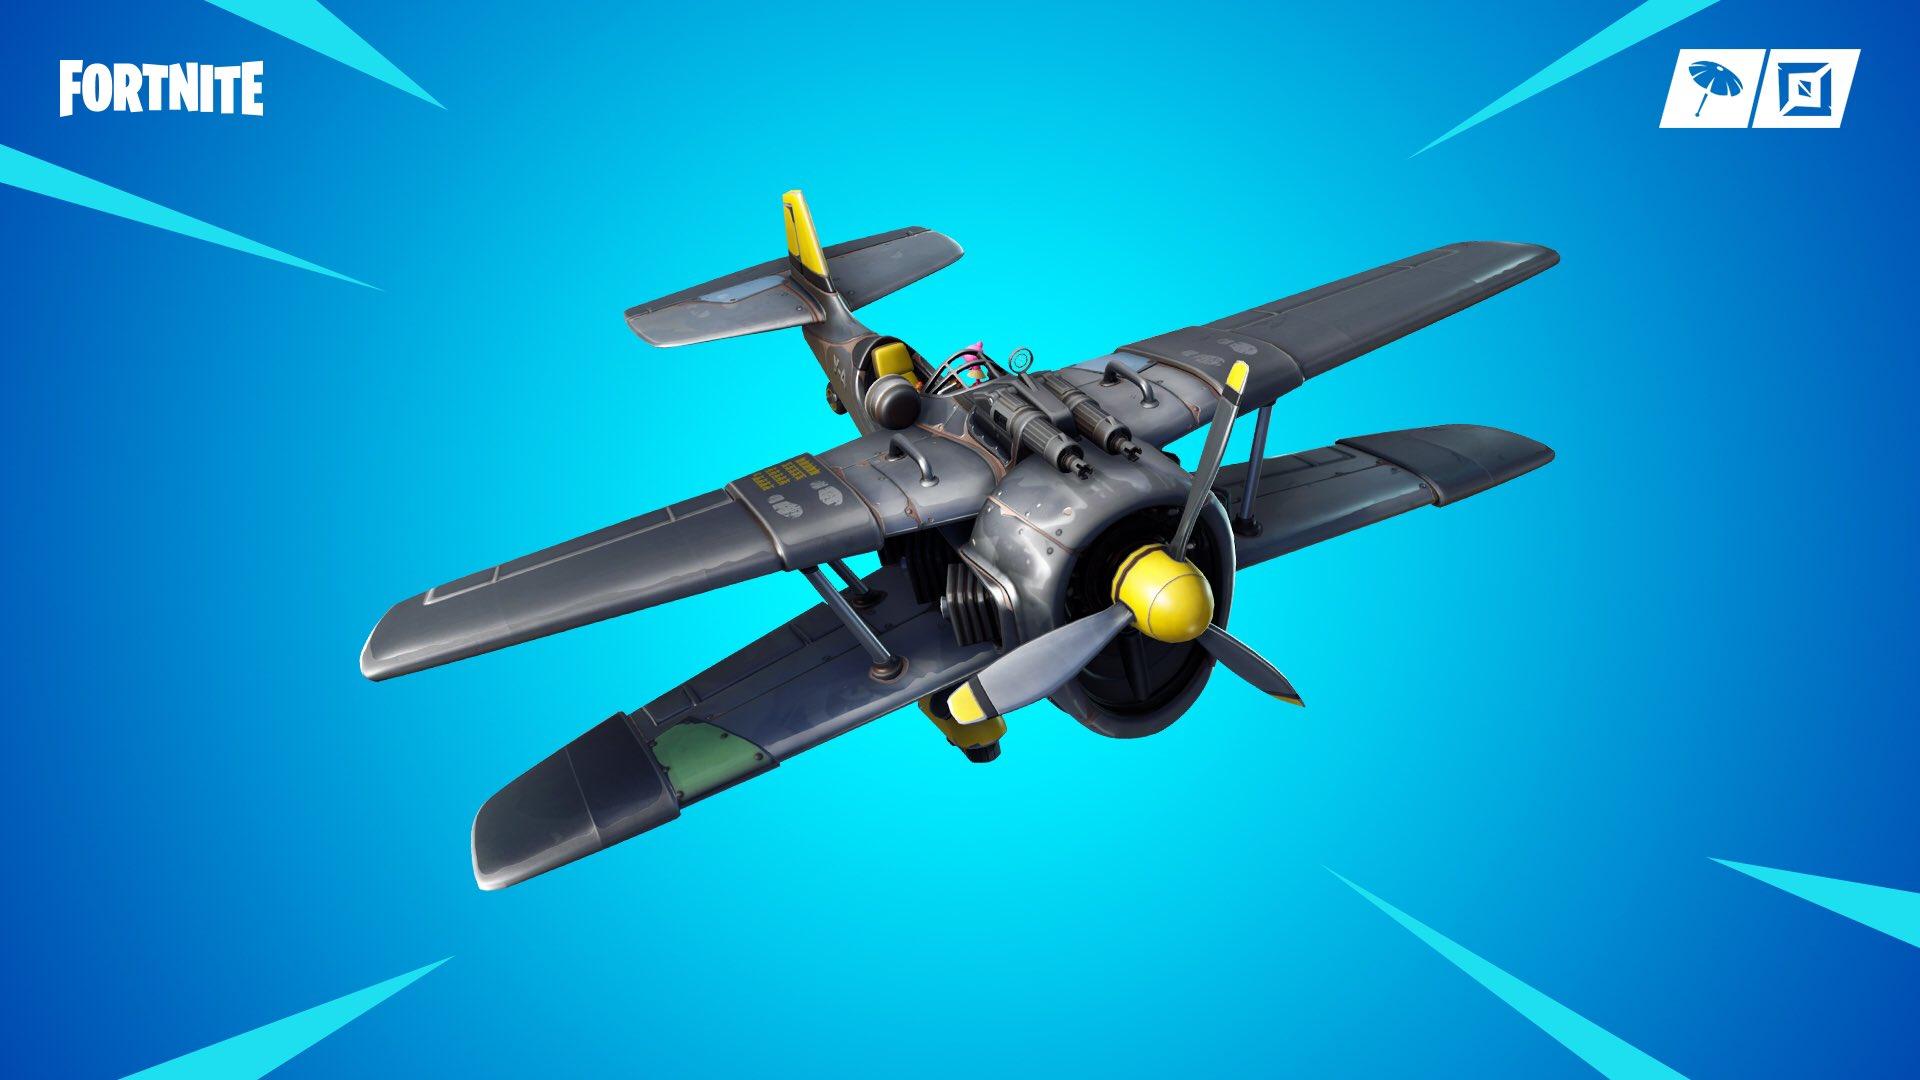 Fortnite X4 Stormwing